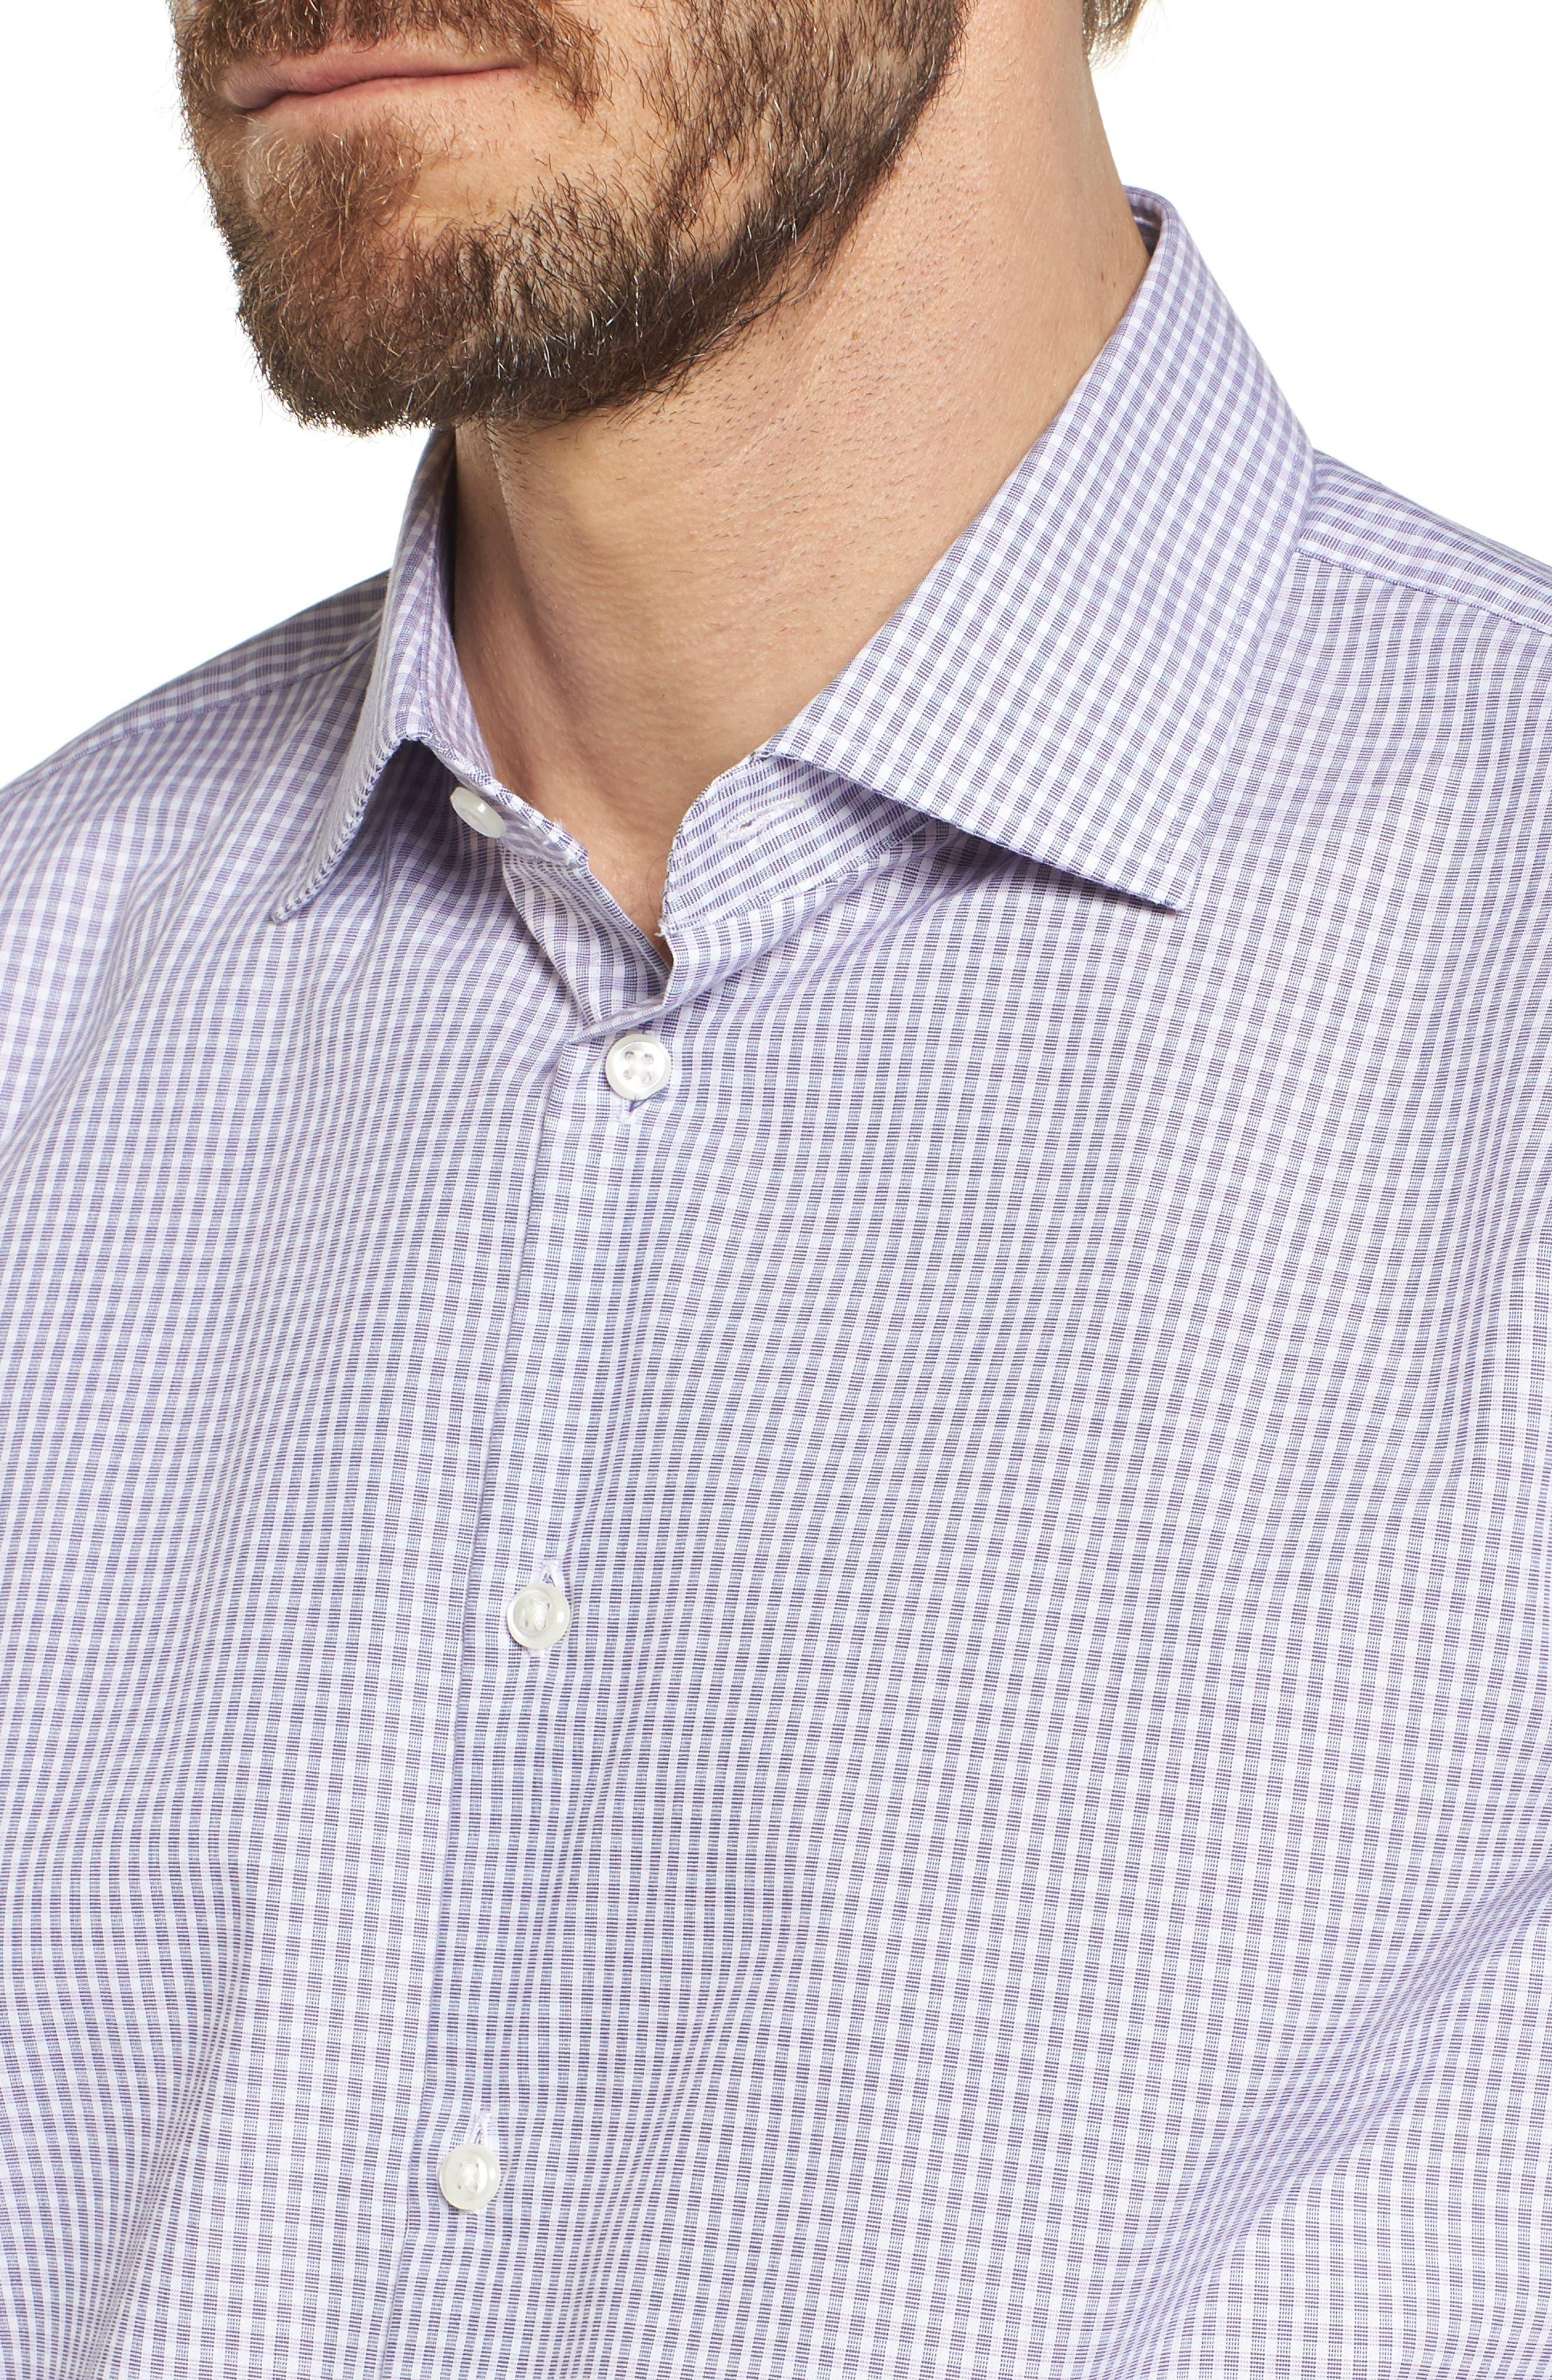 Extra Trim Fit Non-Iron Check Dress Shirt,                             Alternate thumbnail 5, color,